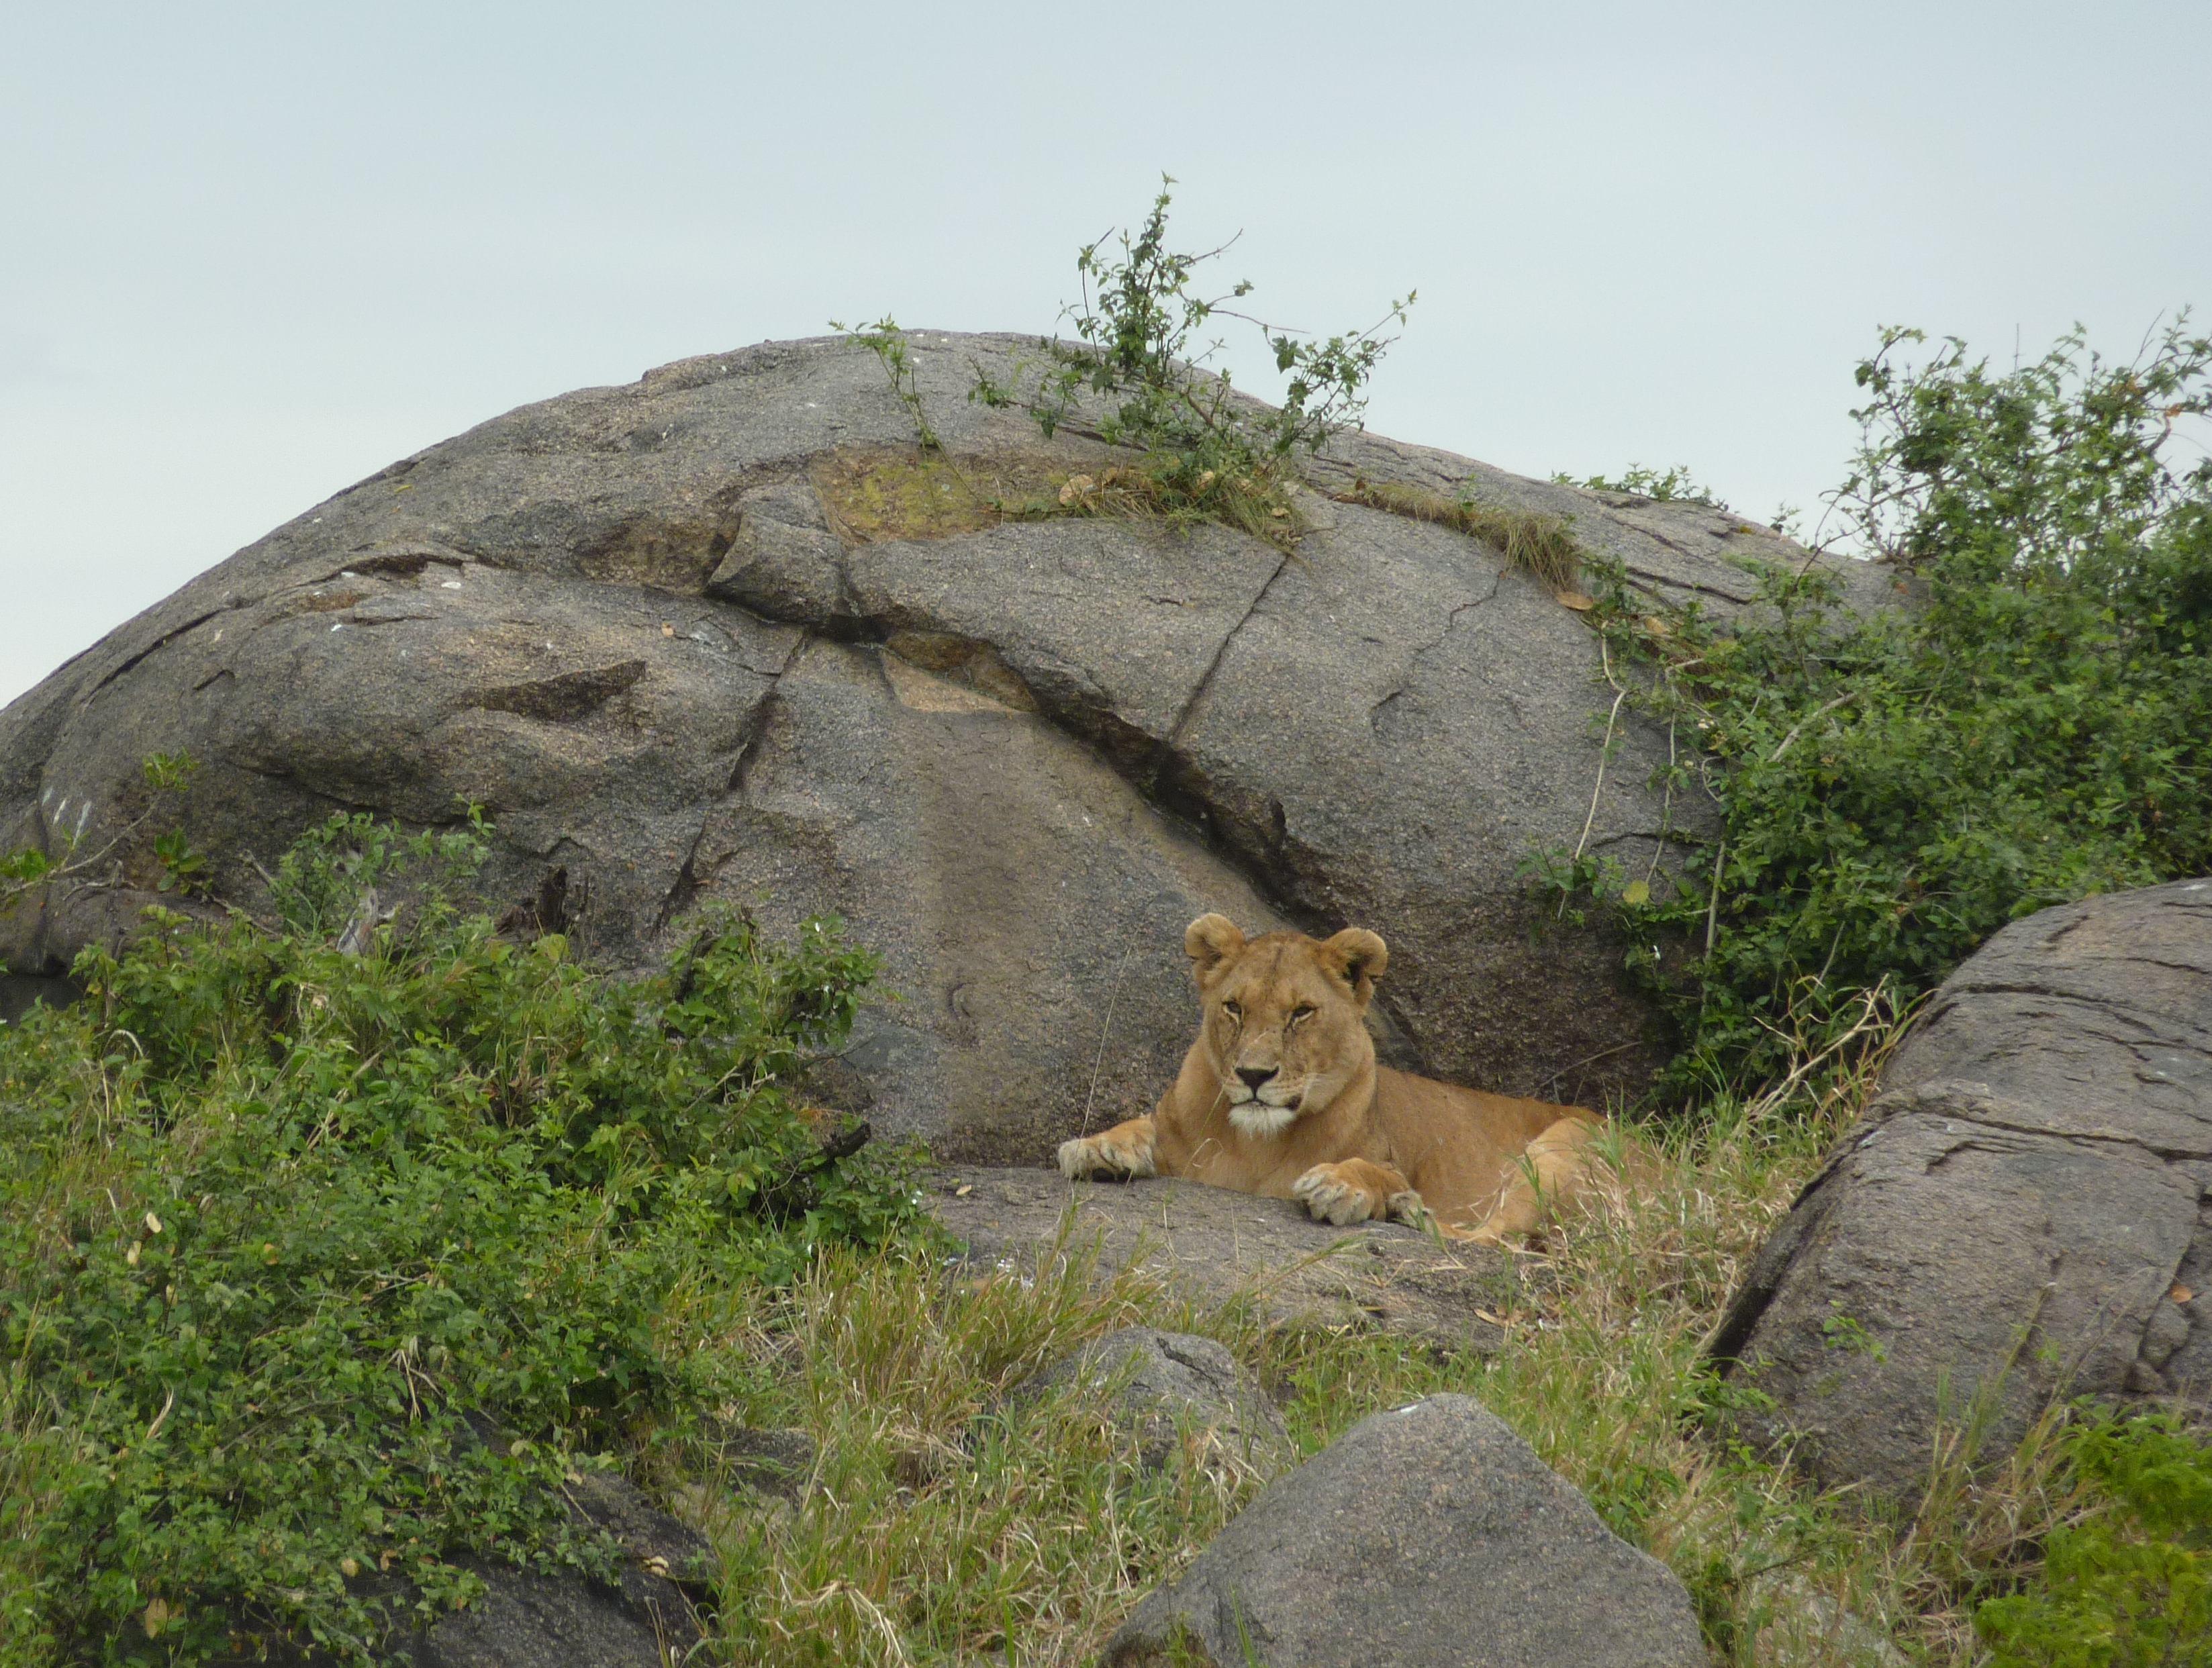 File:Lioness on rocks in Serengeti National Park, Tanzania ...